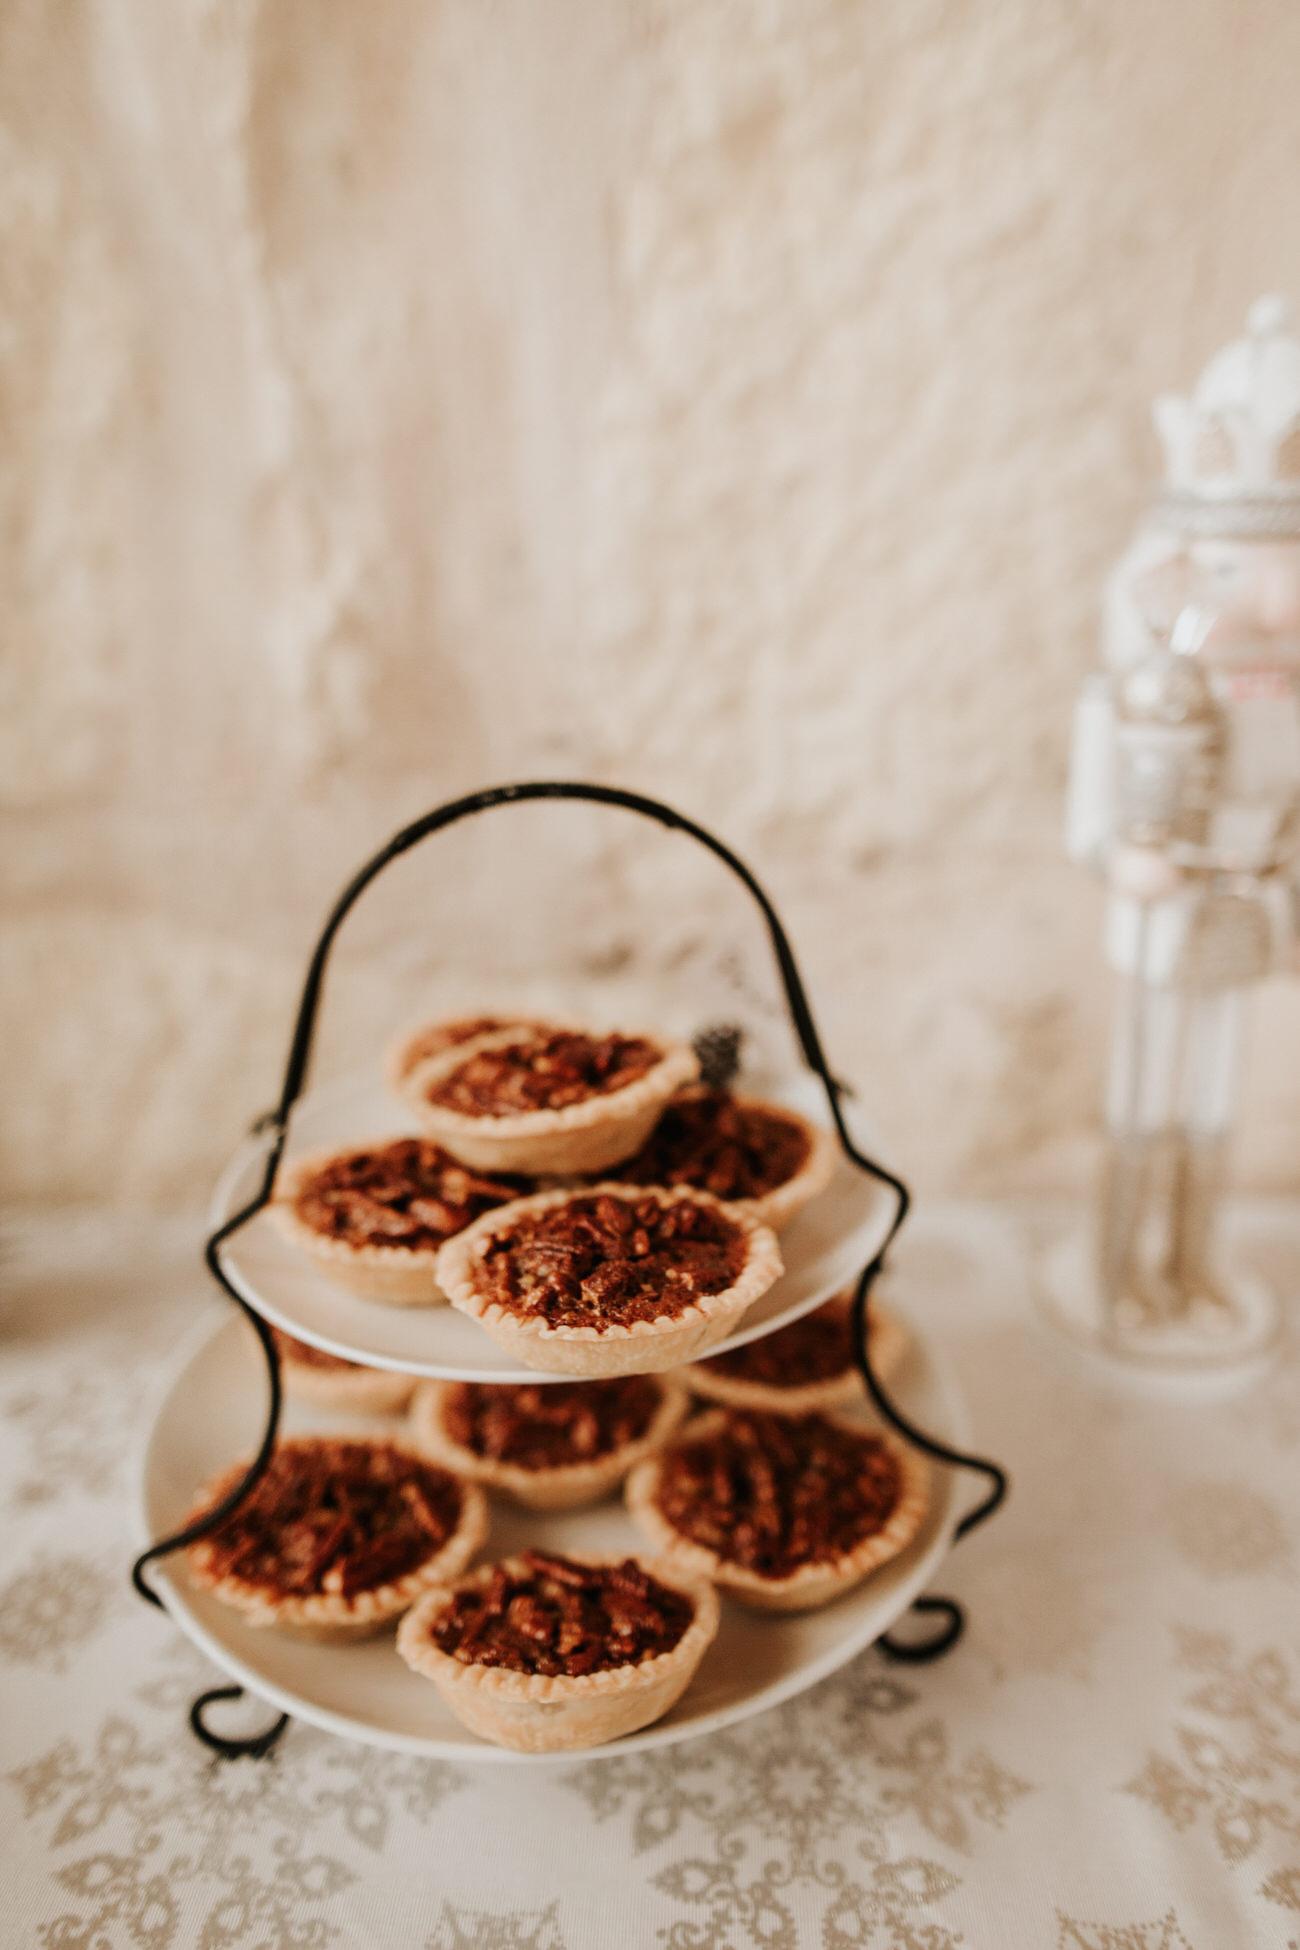 Mini pies at wedding dessert table